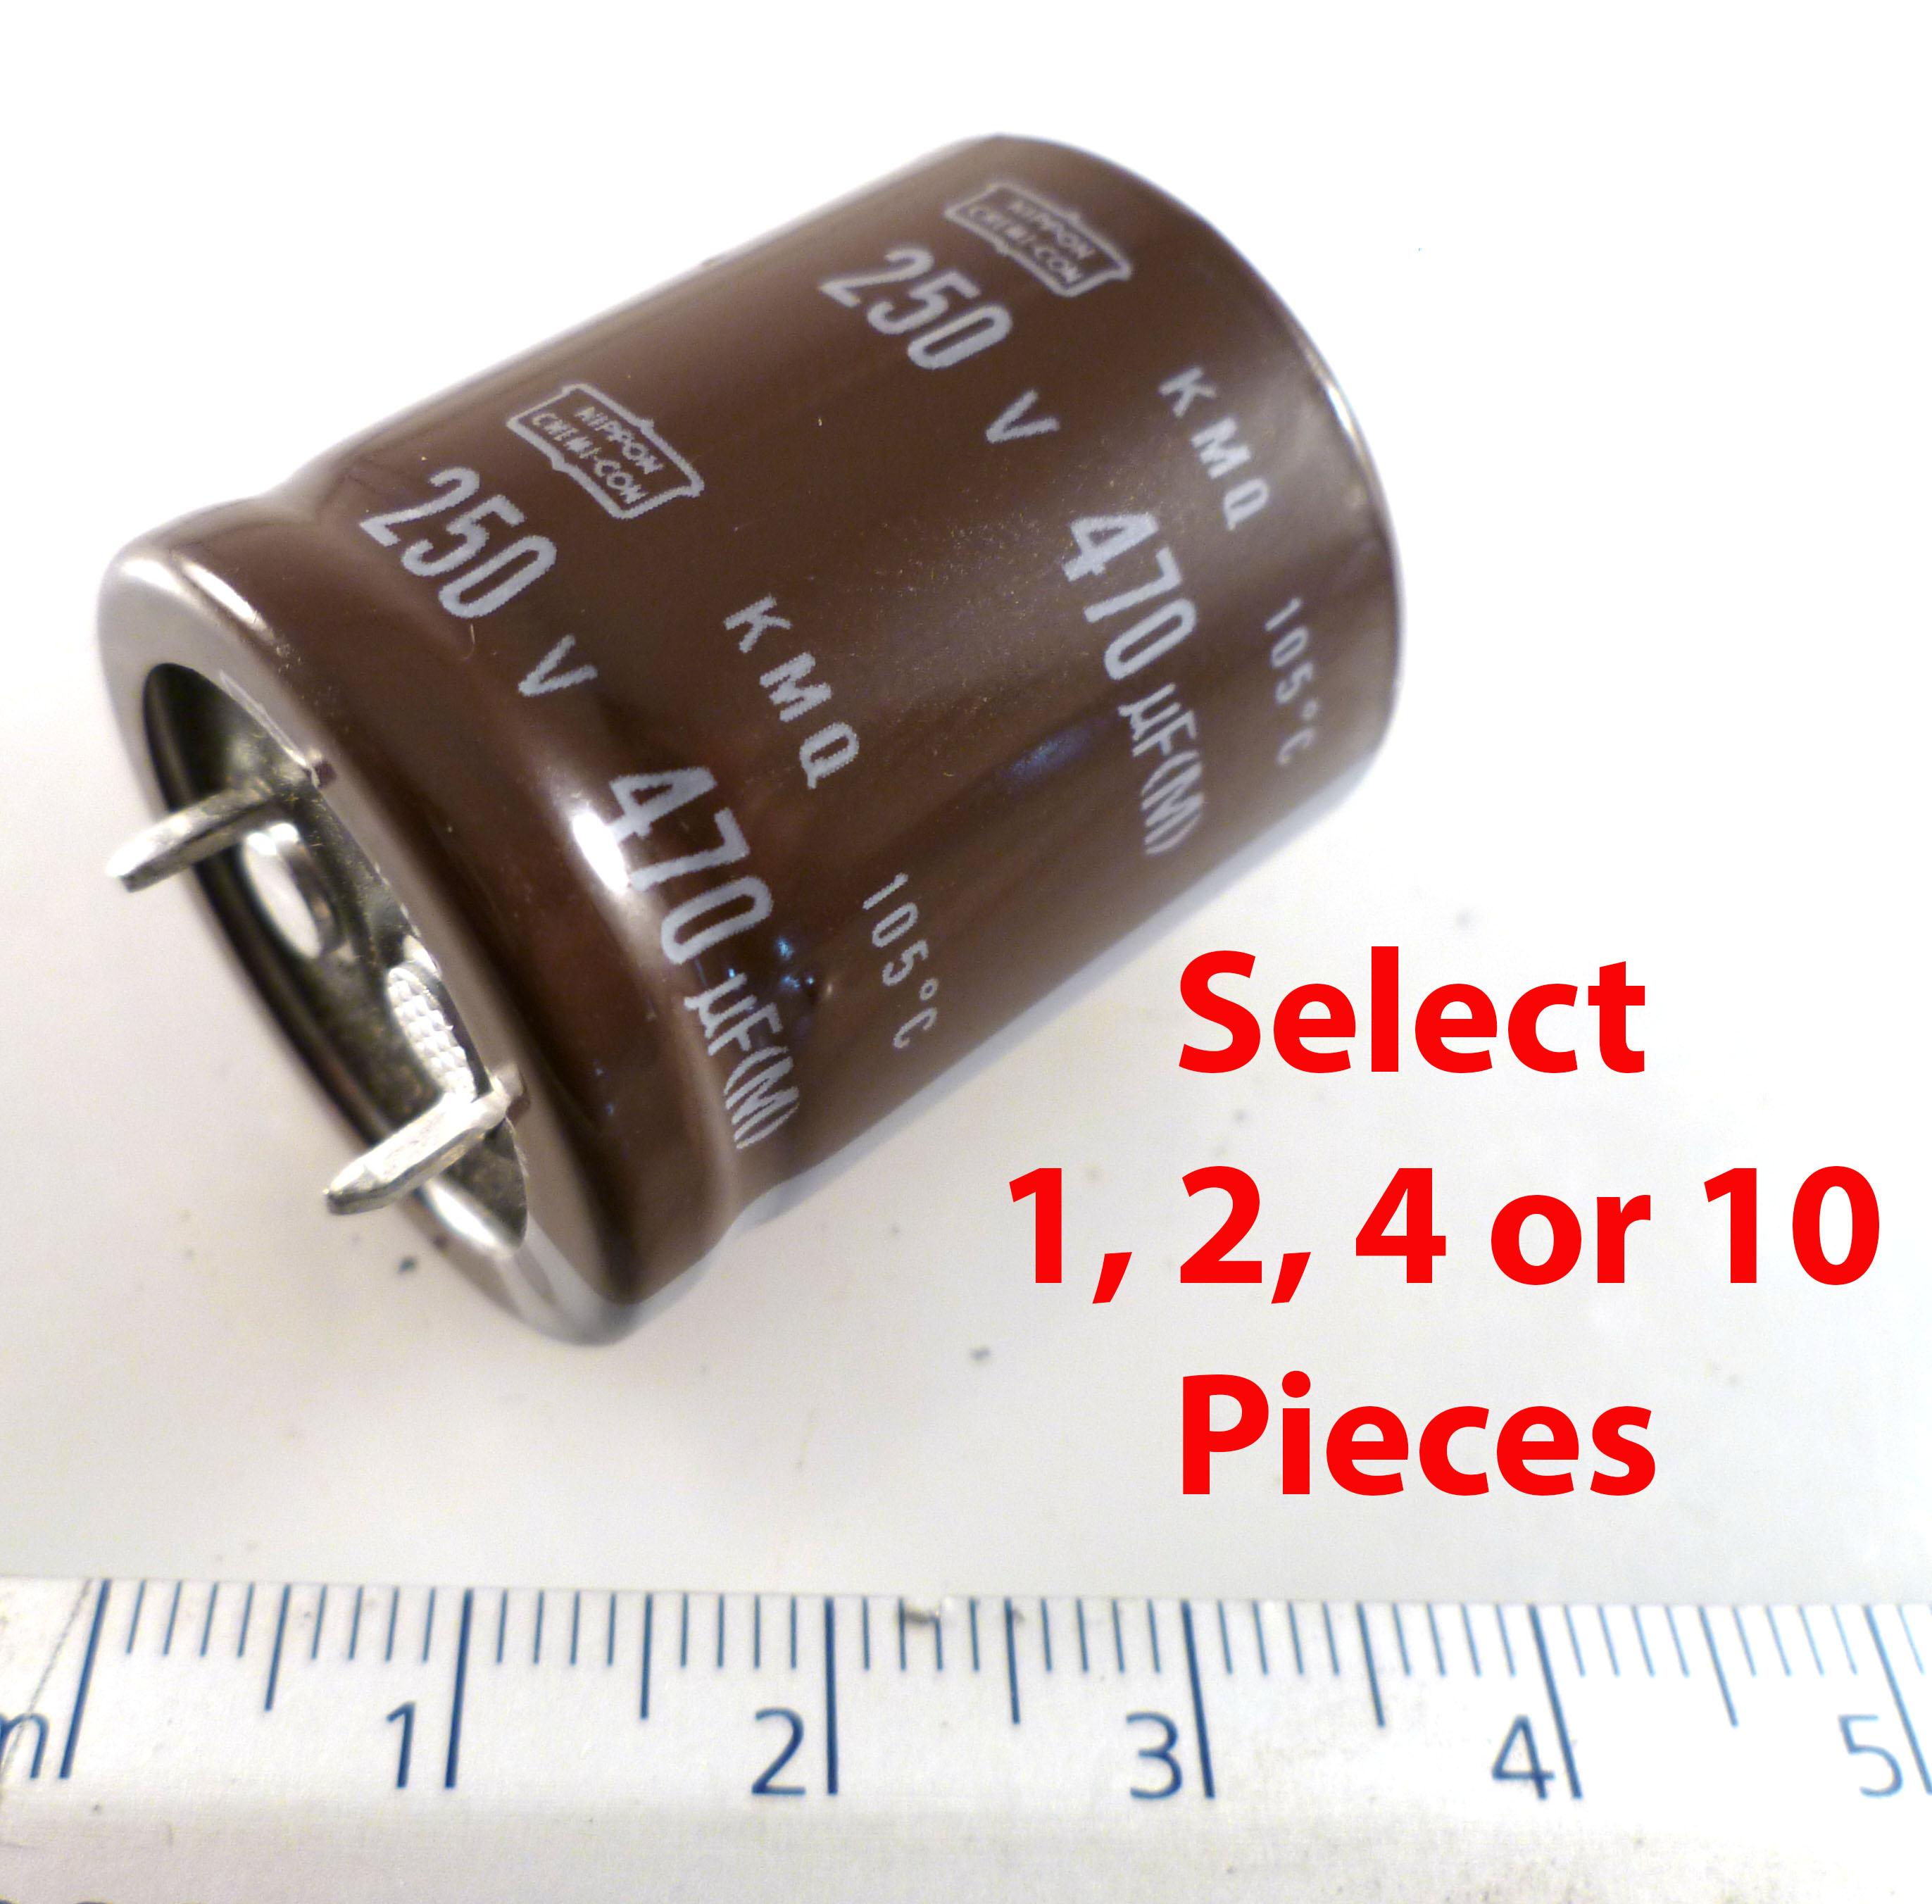 Nichicon UPM1V151MPD6 Electrolytic Capacitor 150uF 35V 105/'C 10 Pieces MBF020A